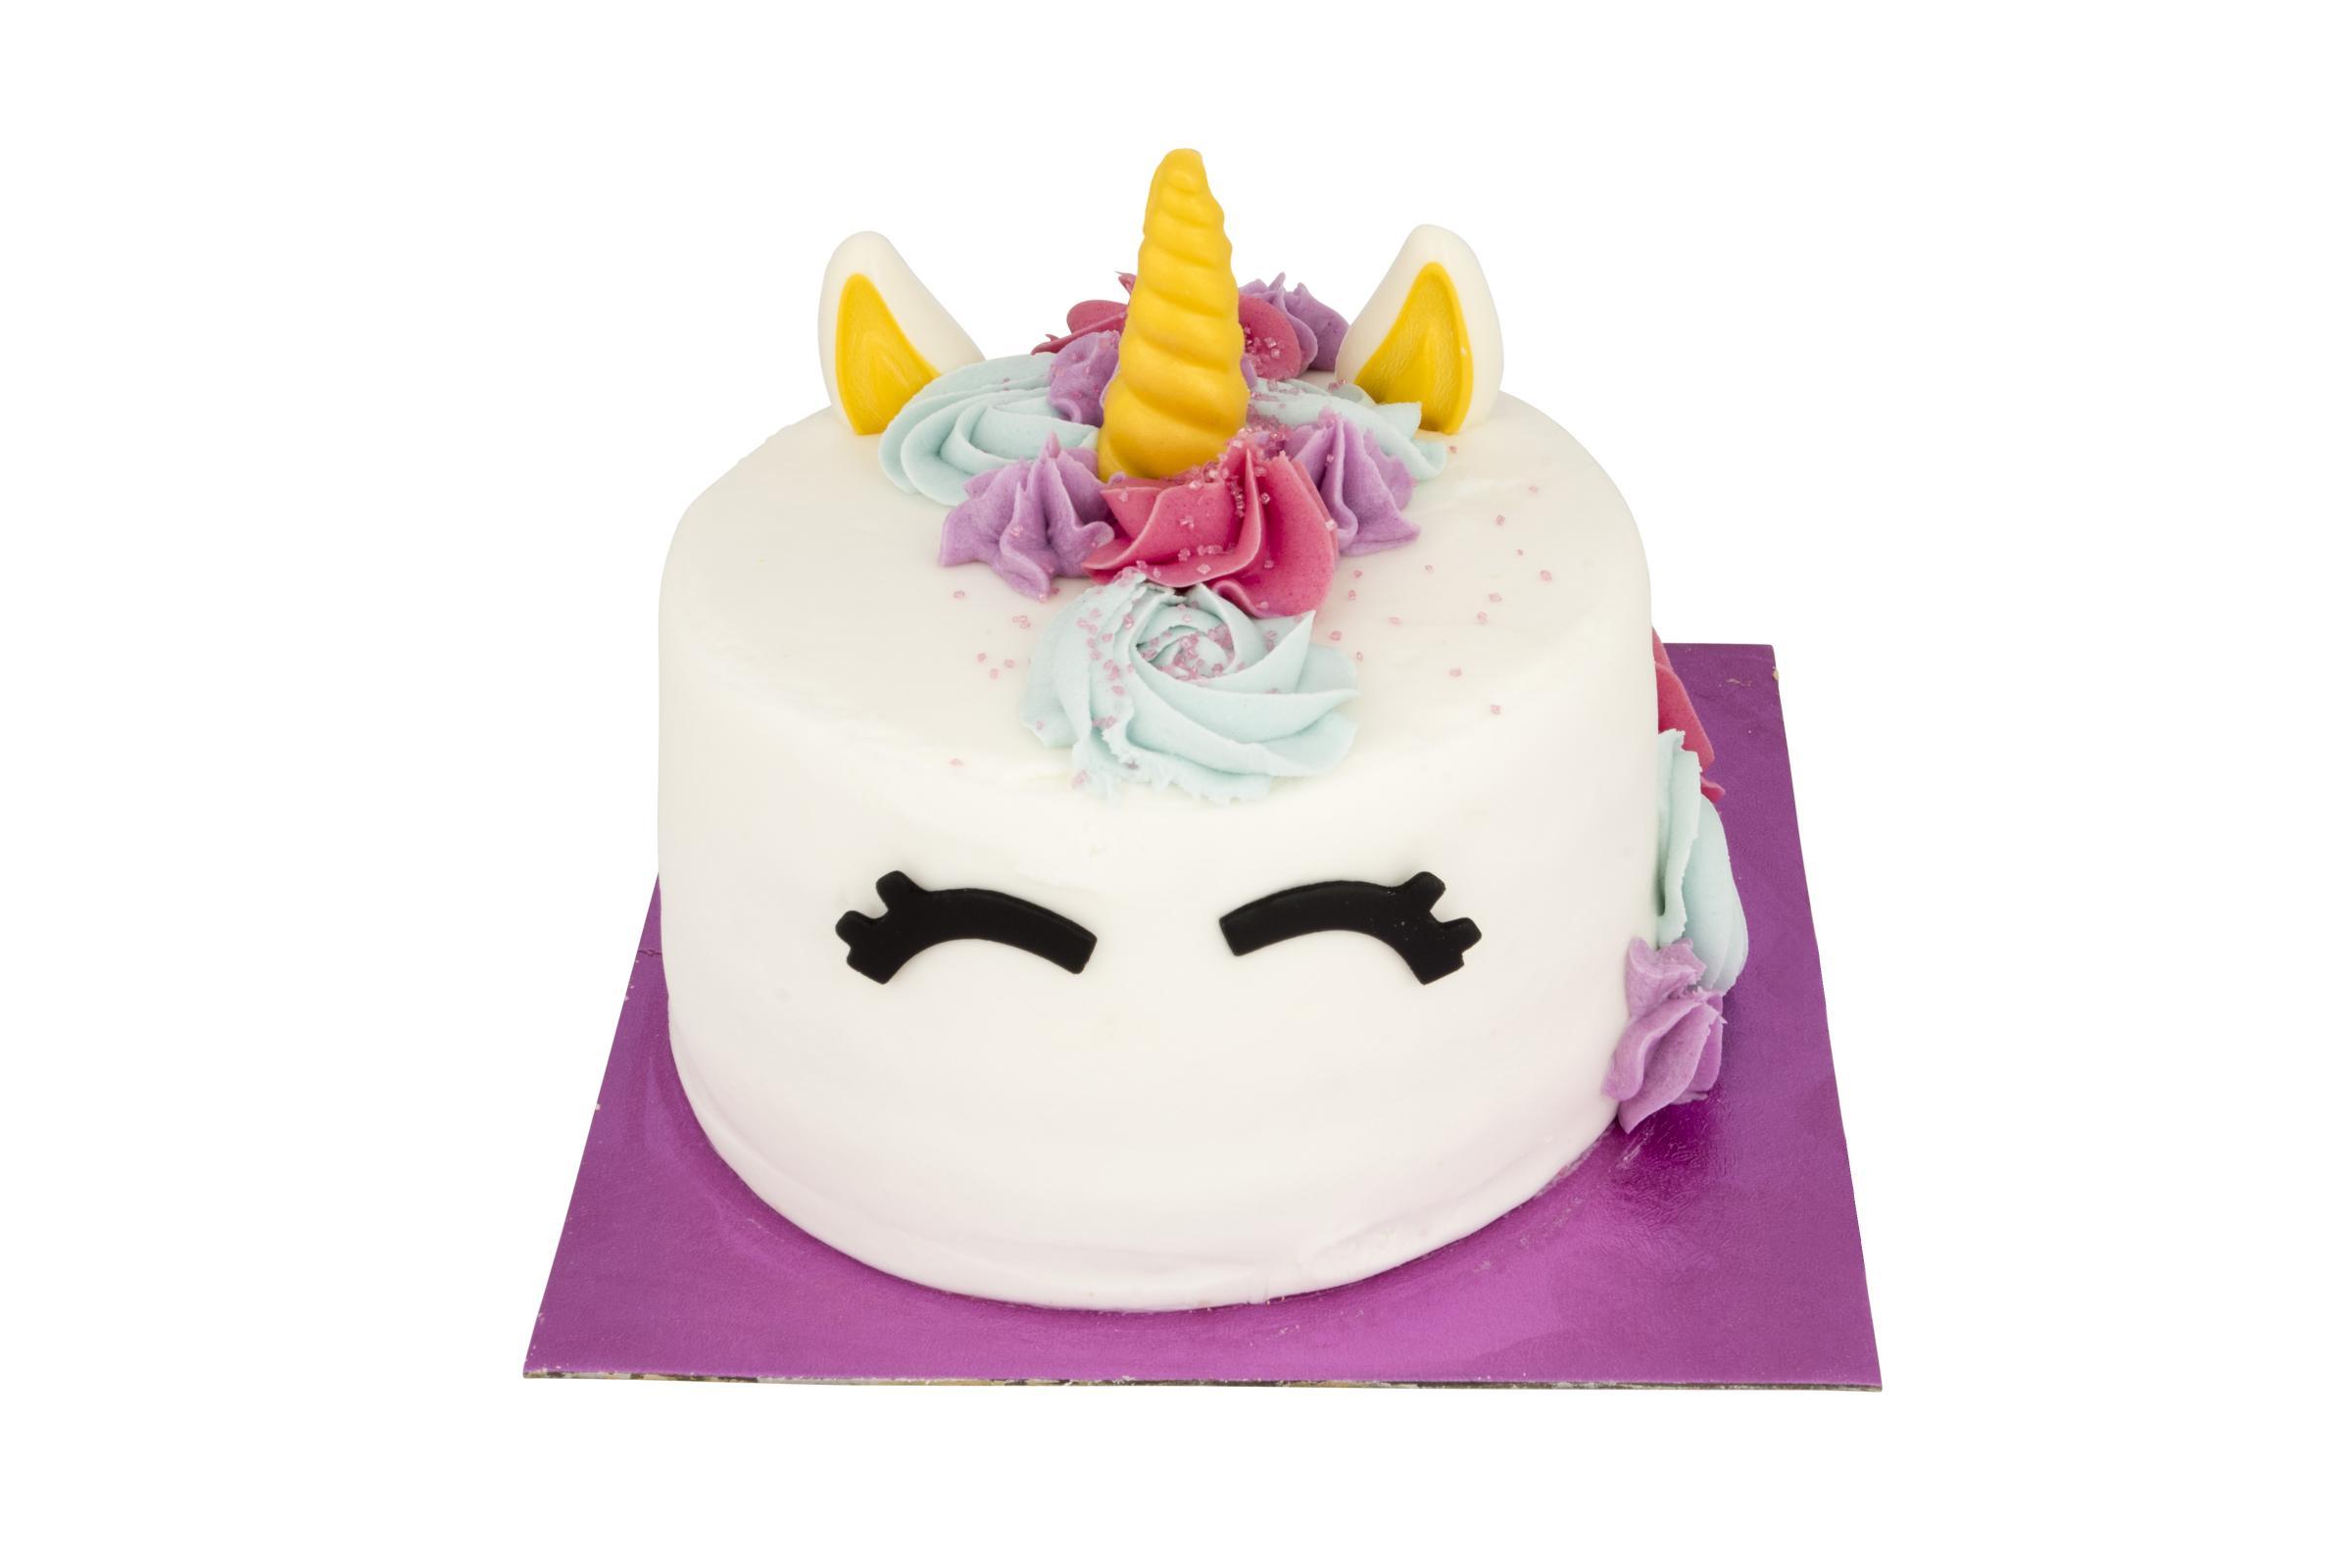 Image Of Racing Car Cake Asda Disney Cars 2 Birthday Cake Asda